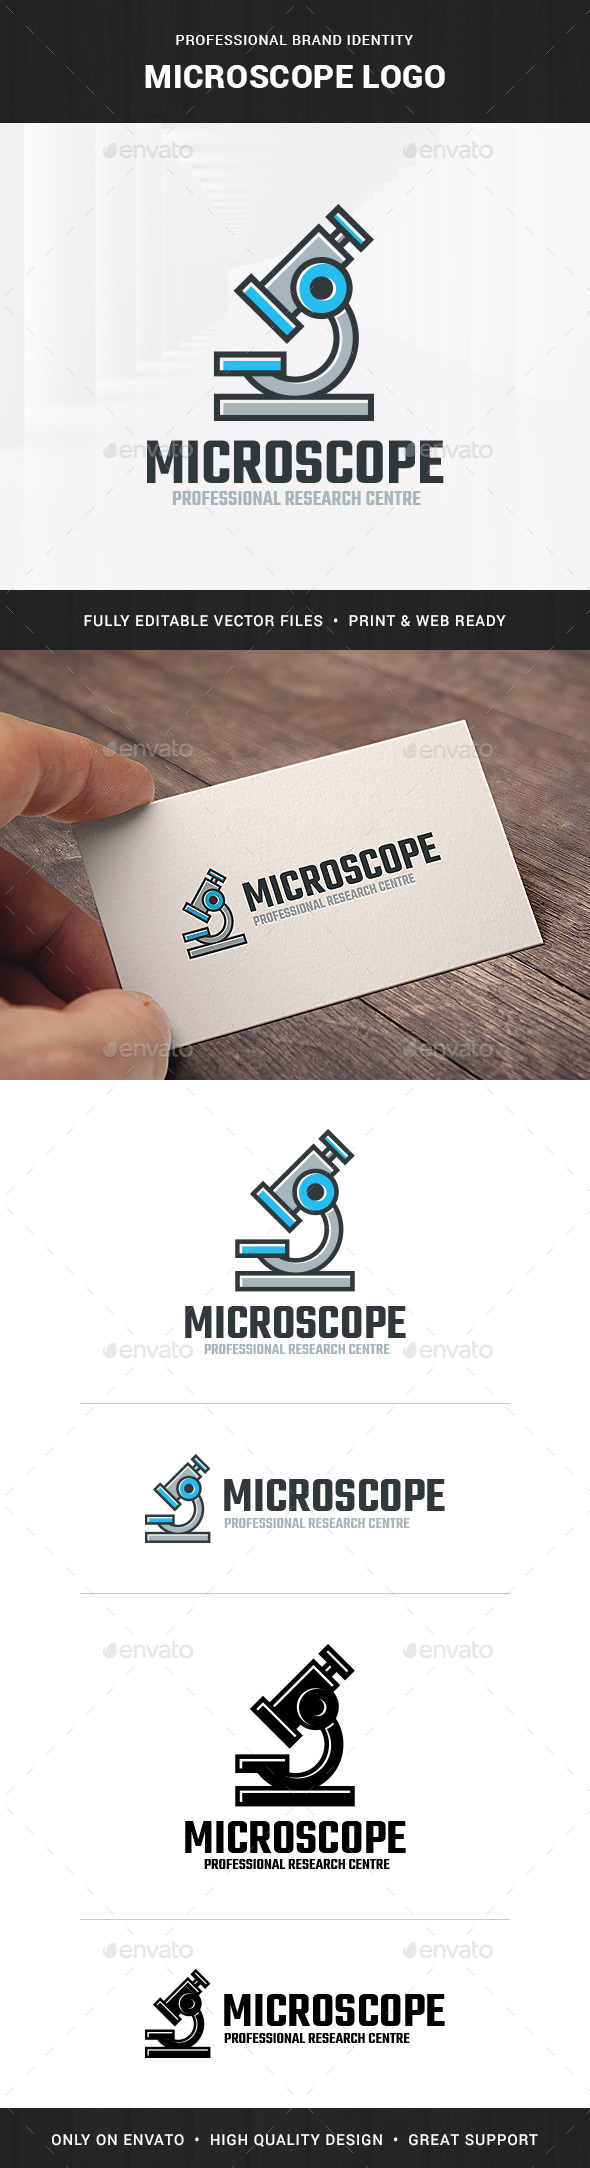 Microscope Logo Template